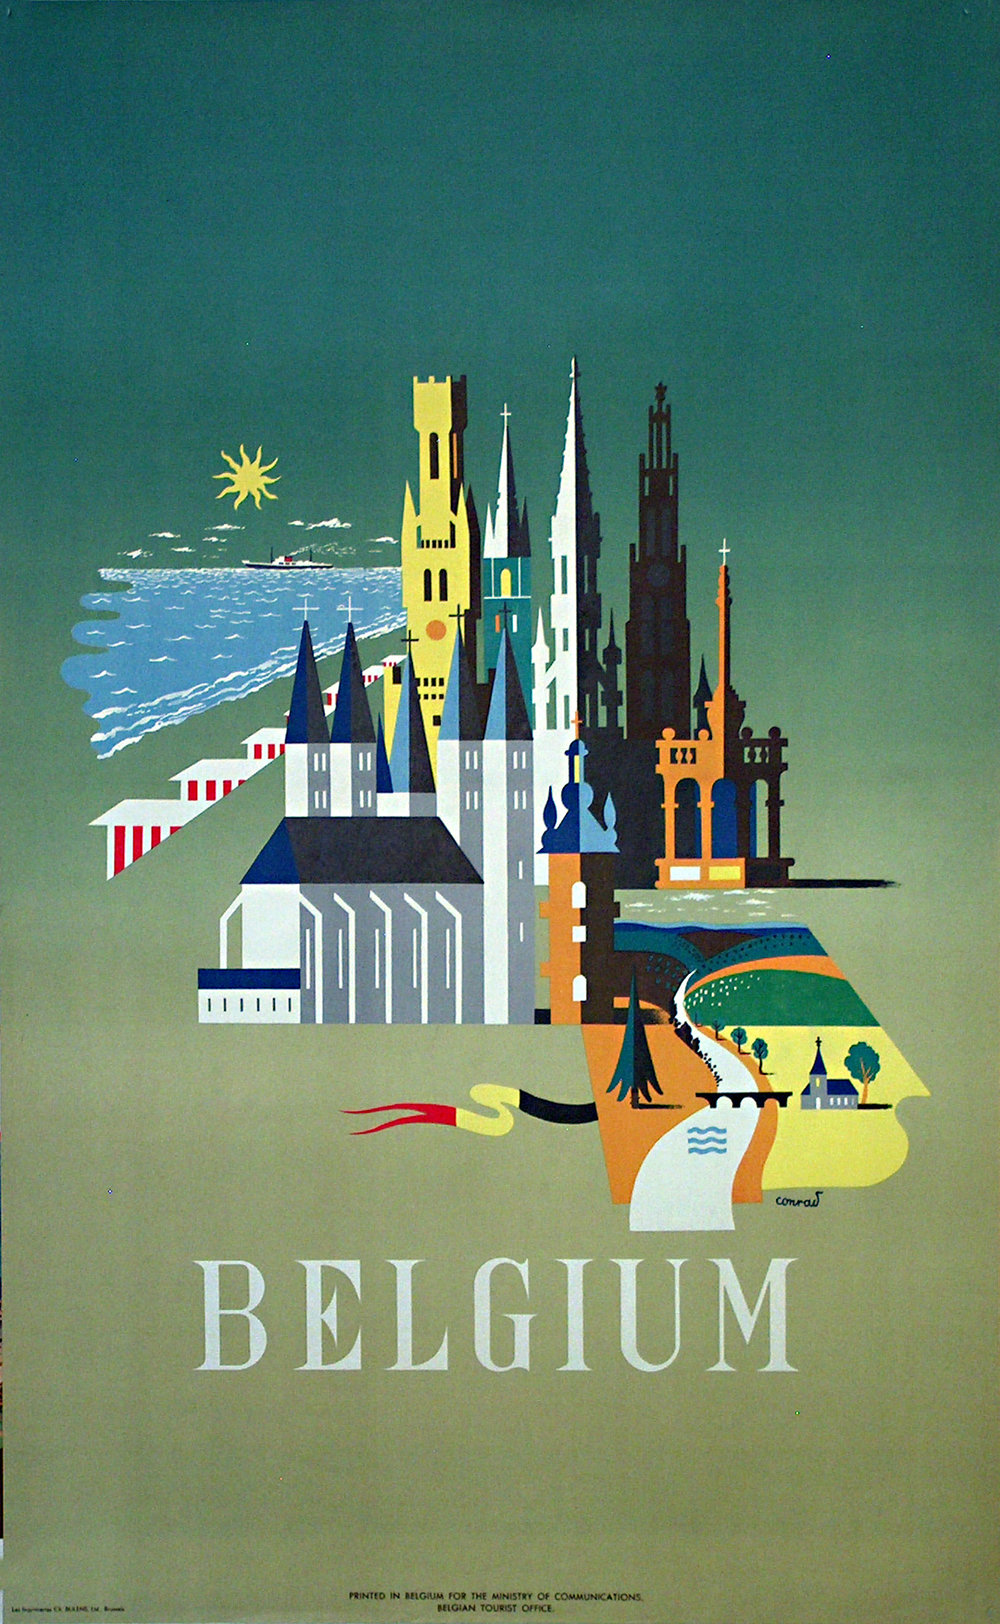 belgium.vintage.travel.poster.jpg